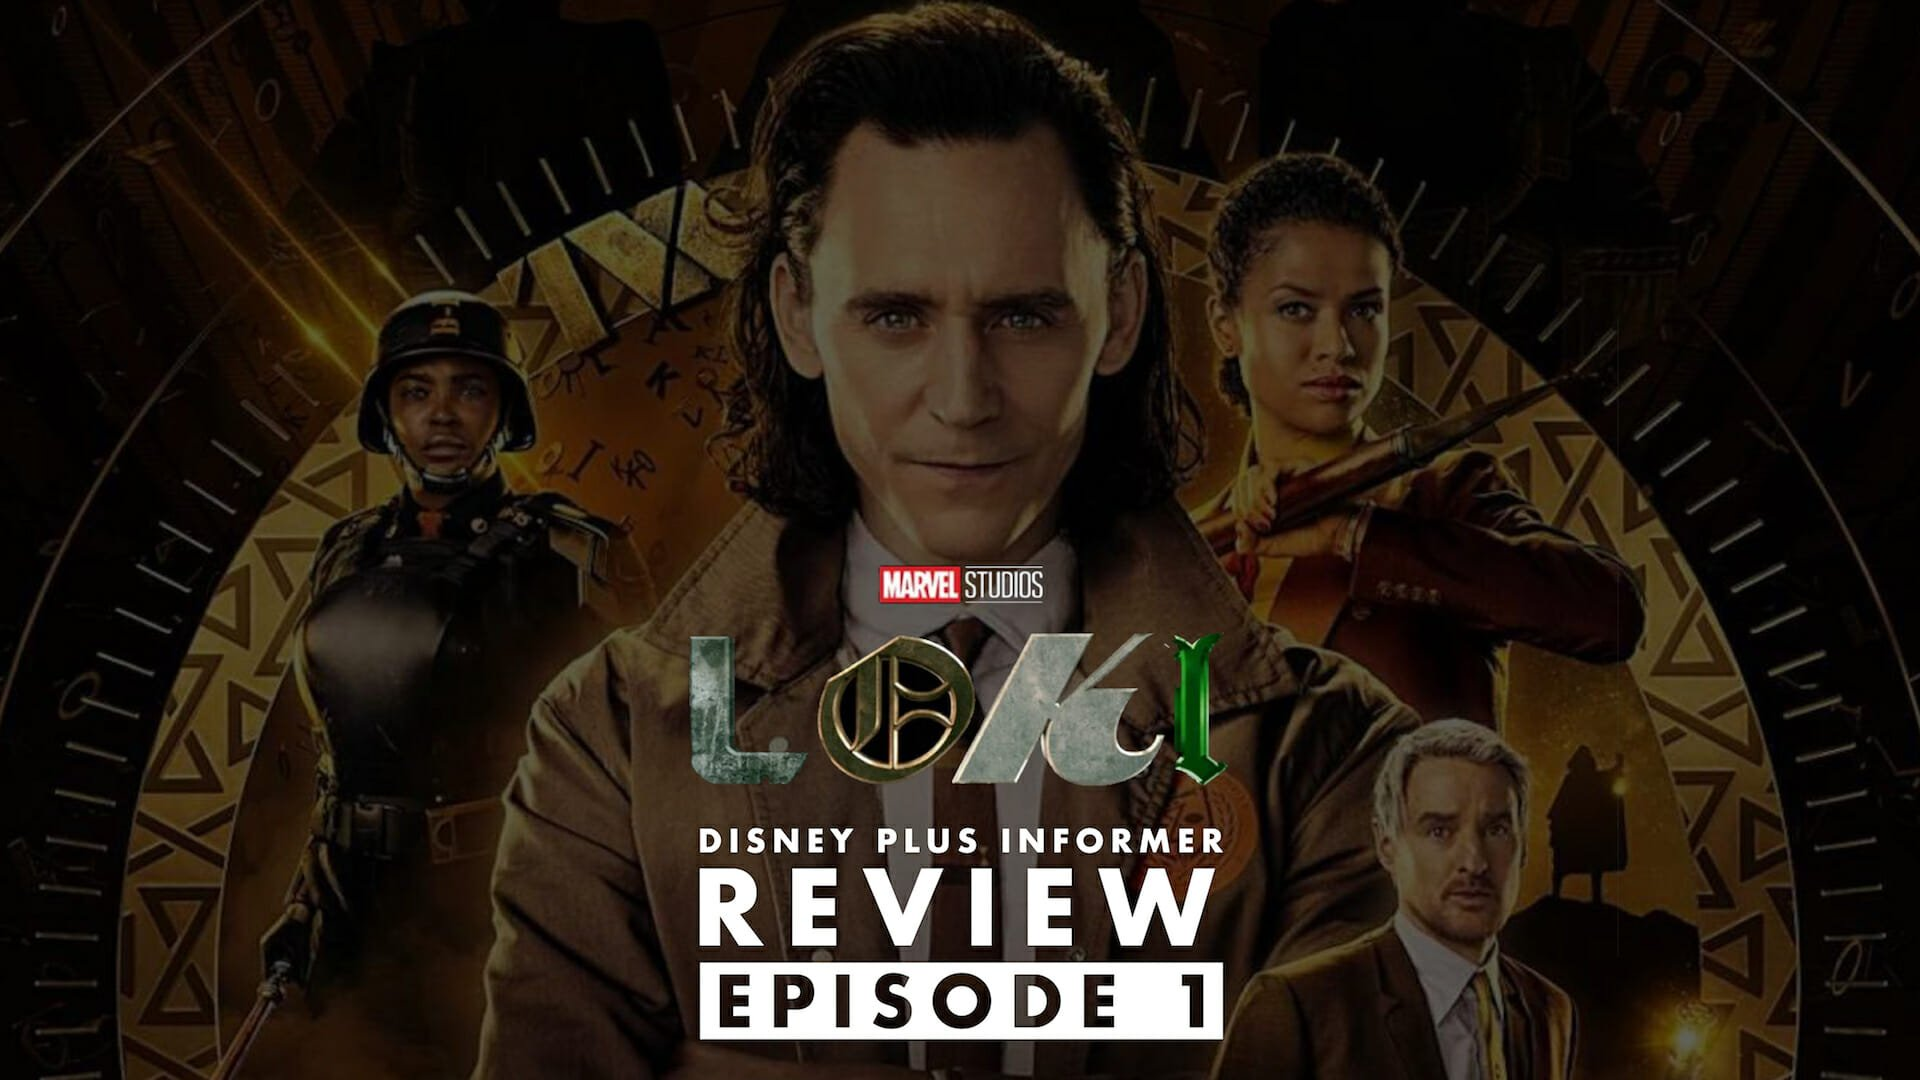 Loki Episode 1 Recap – Marvel's God of Mischief Finds New, Glorious Purpose on Disney+